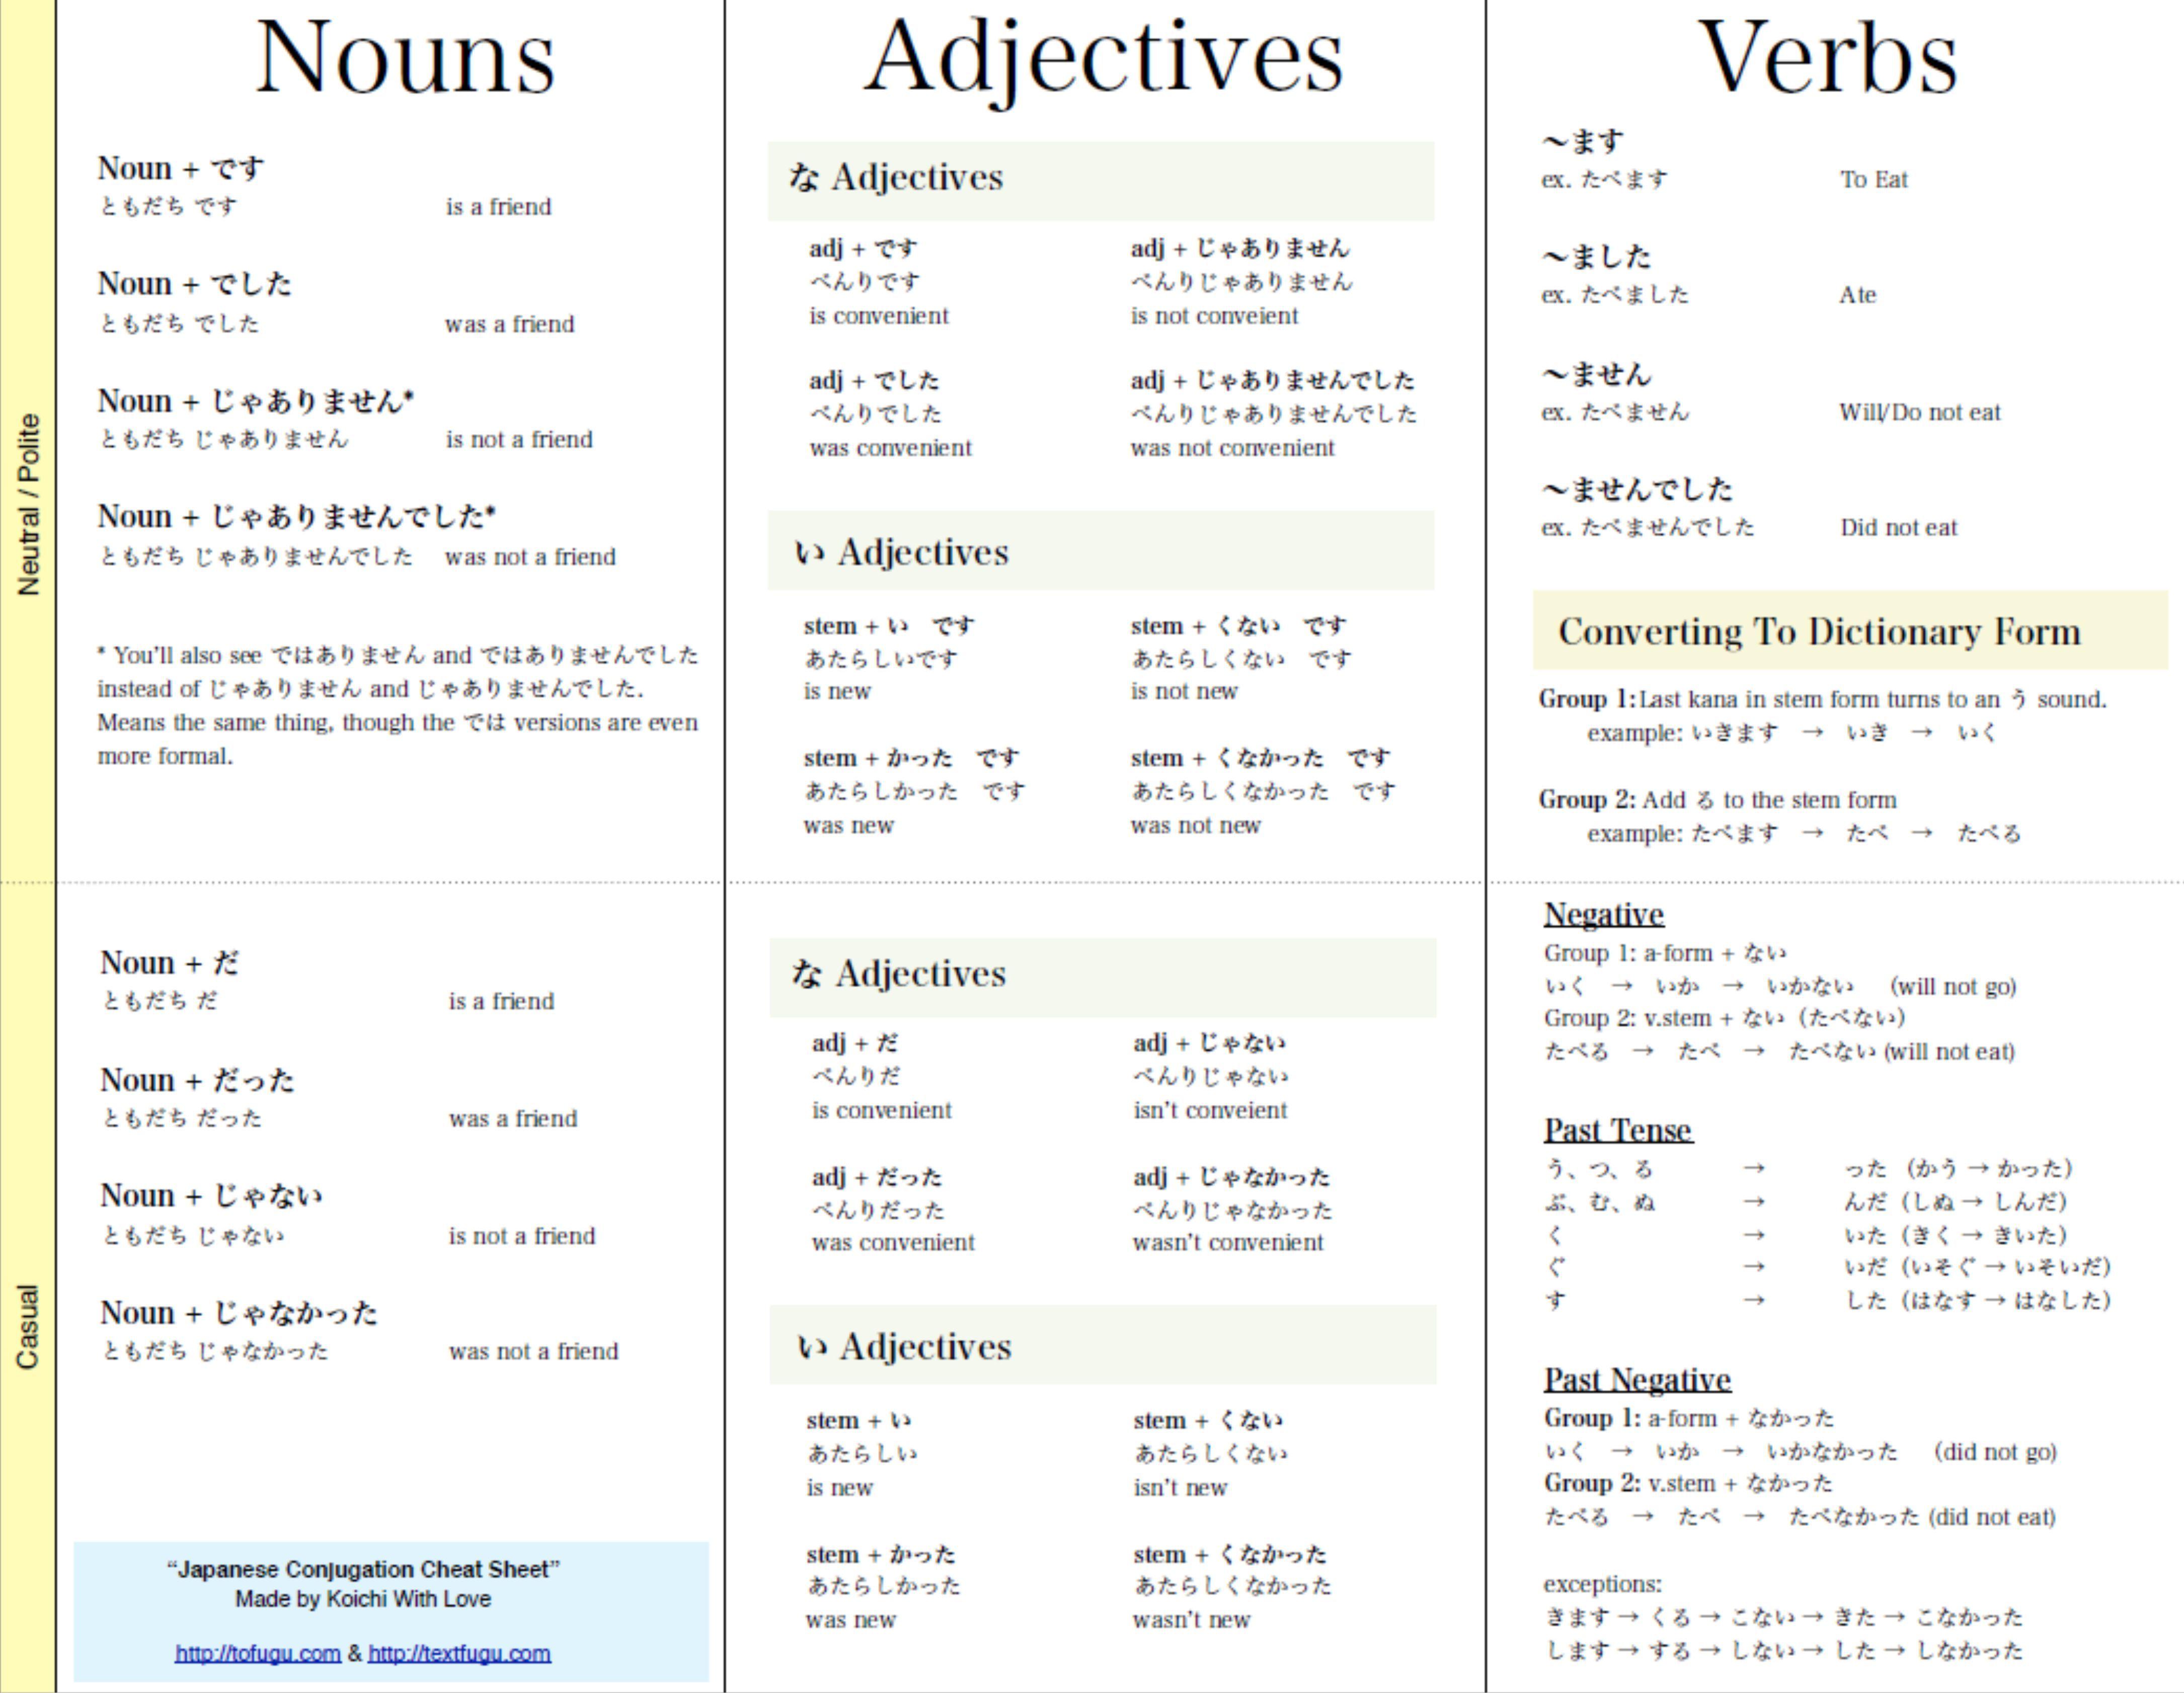 Japanese Conjugation Cheatsheet